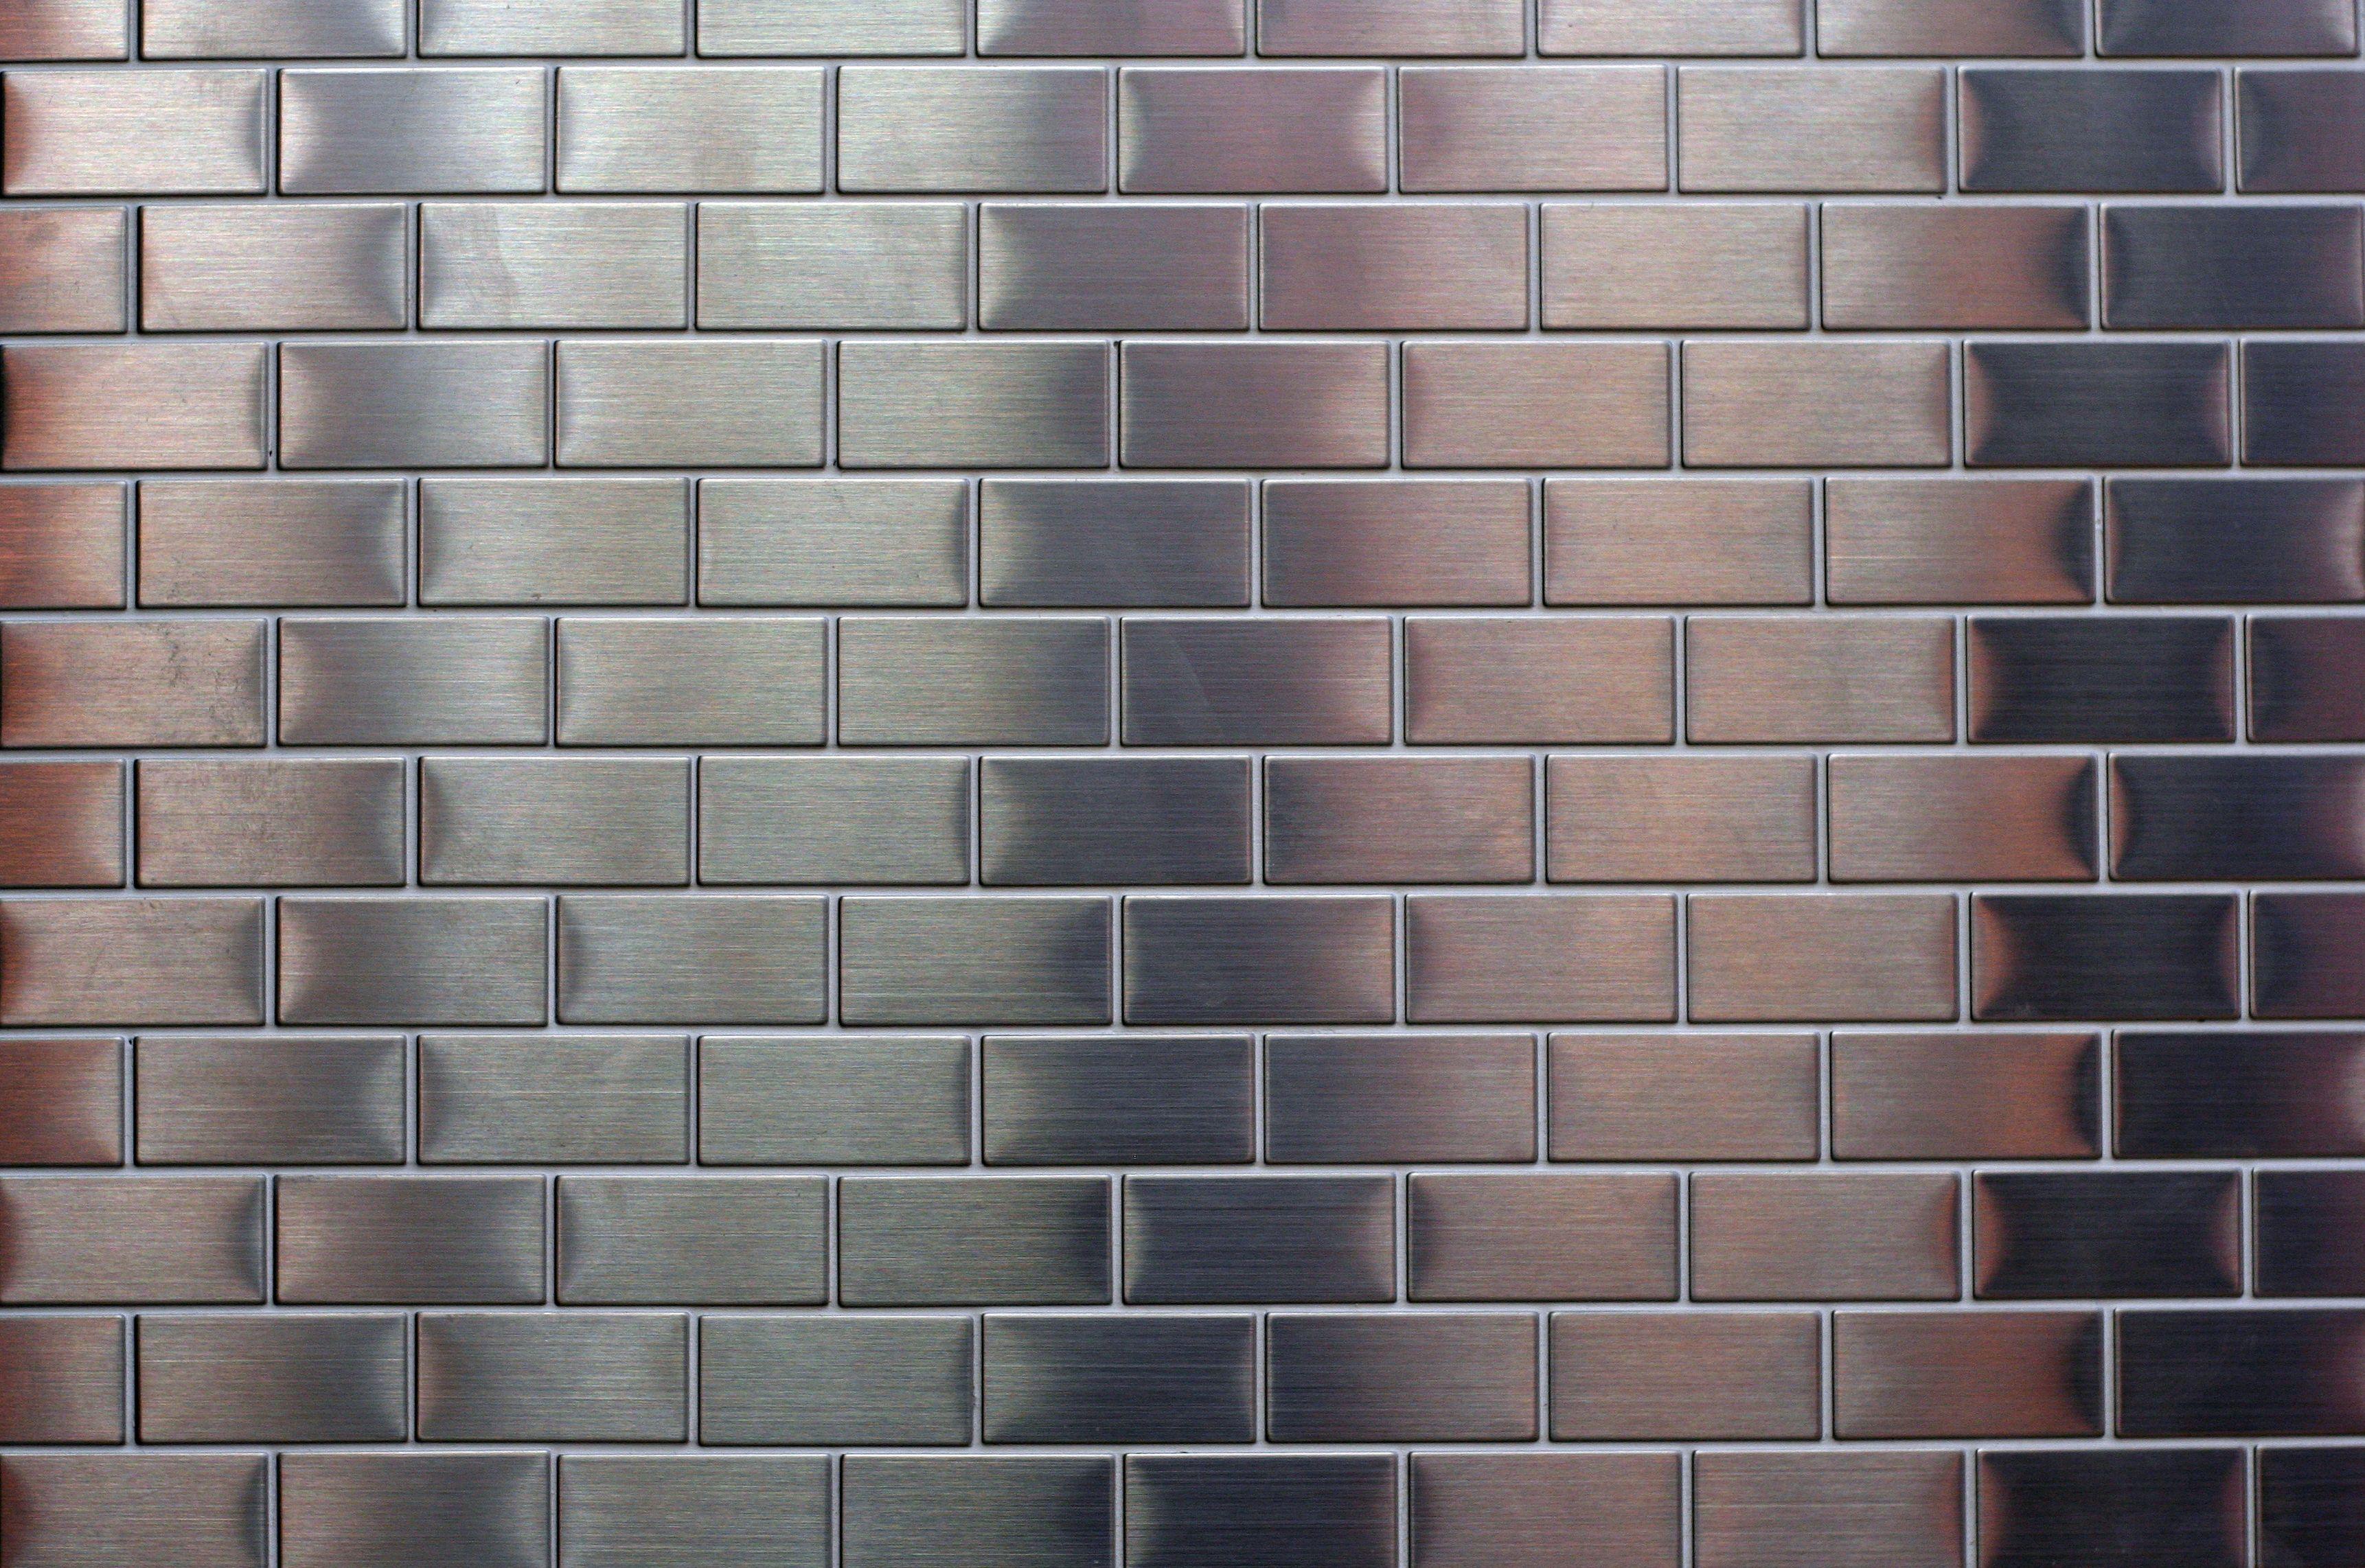 metallic kitchen wall tiles single bowl stainless sink shiny small silver metal tile background free